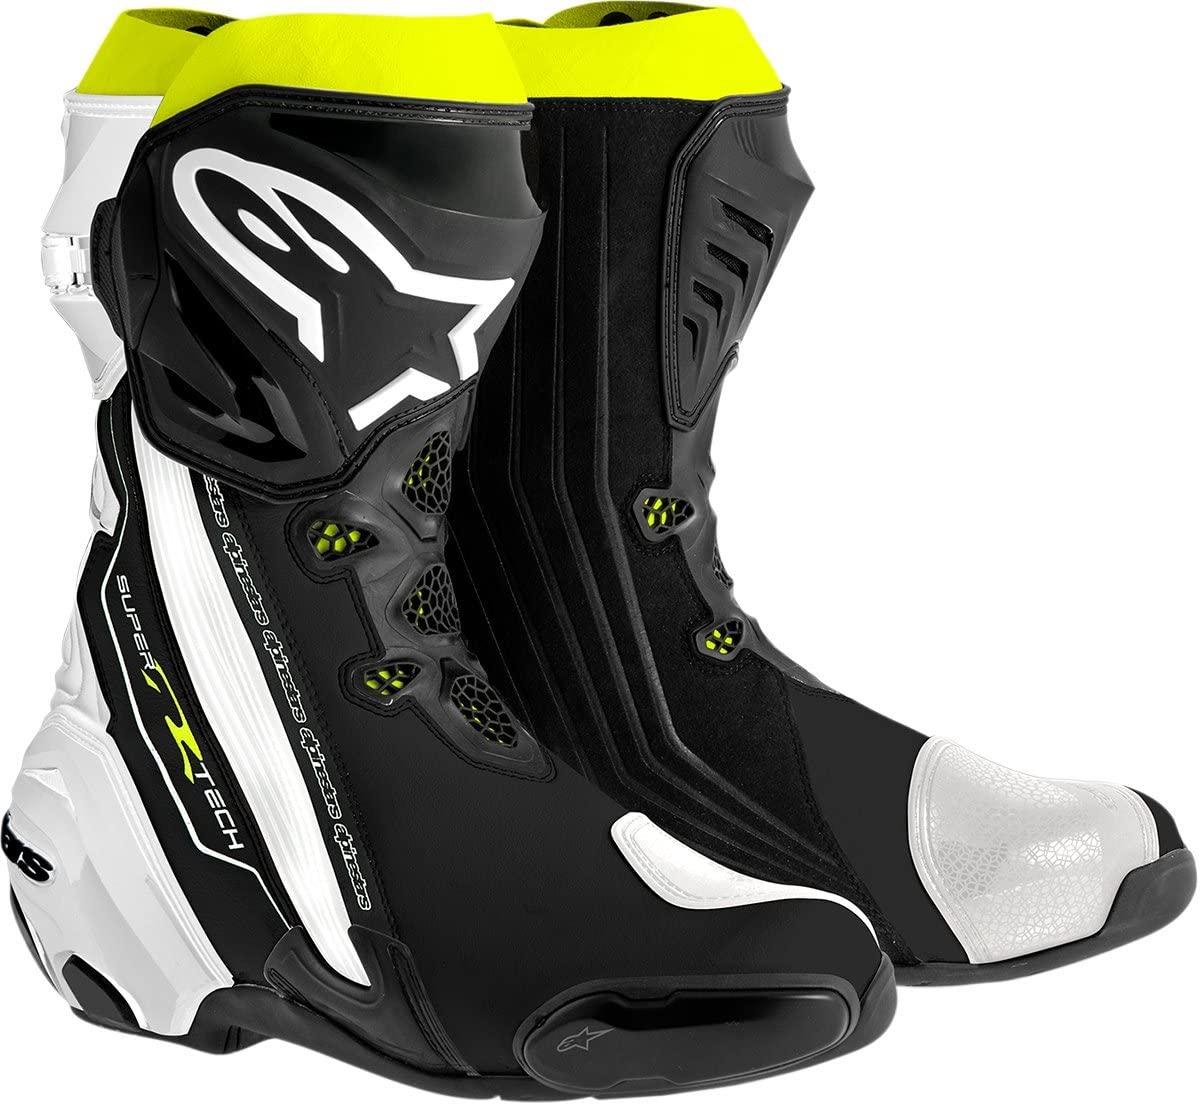 Alpinestars Supertech R Men's Motorcycle Road Racing Boots (Black/White/Fluorescent Yellow, EU Size 39)